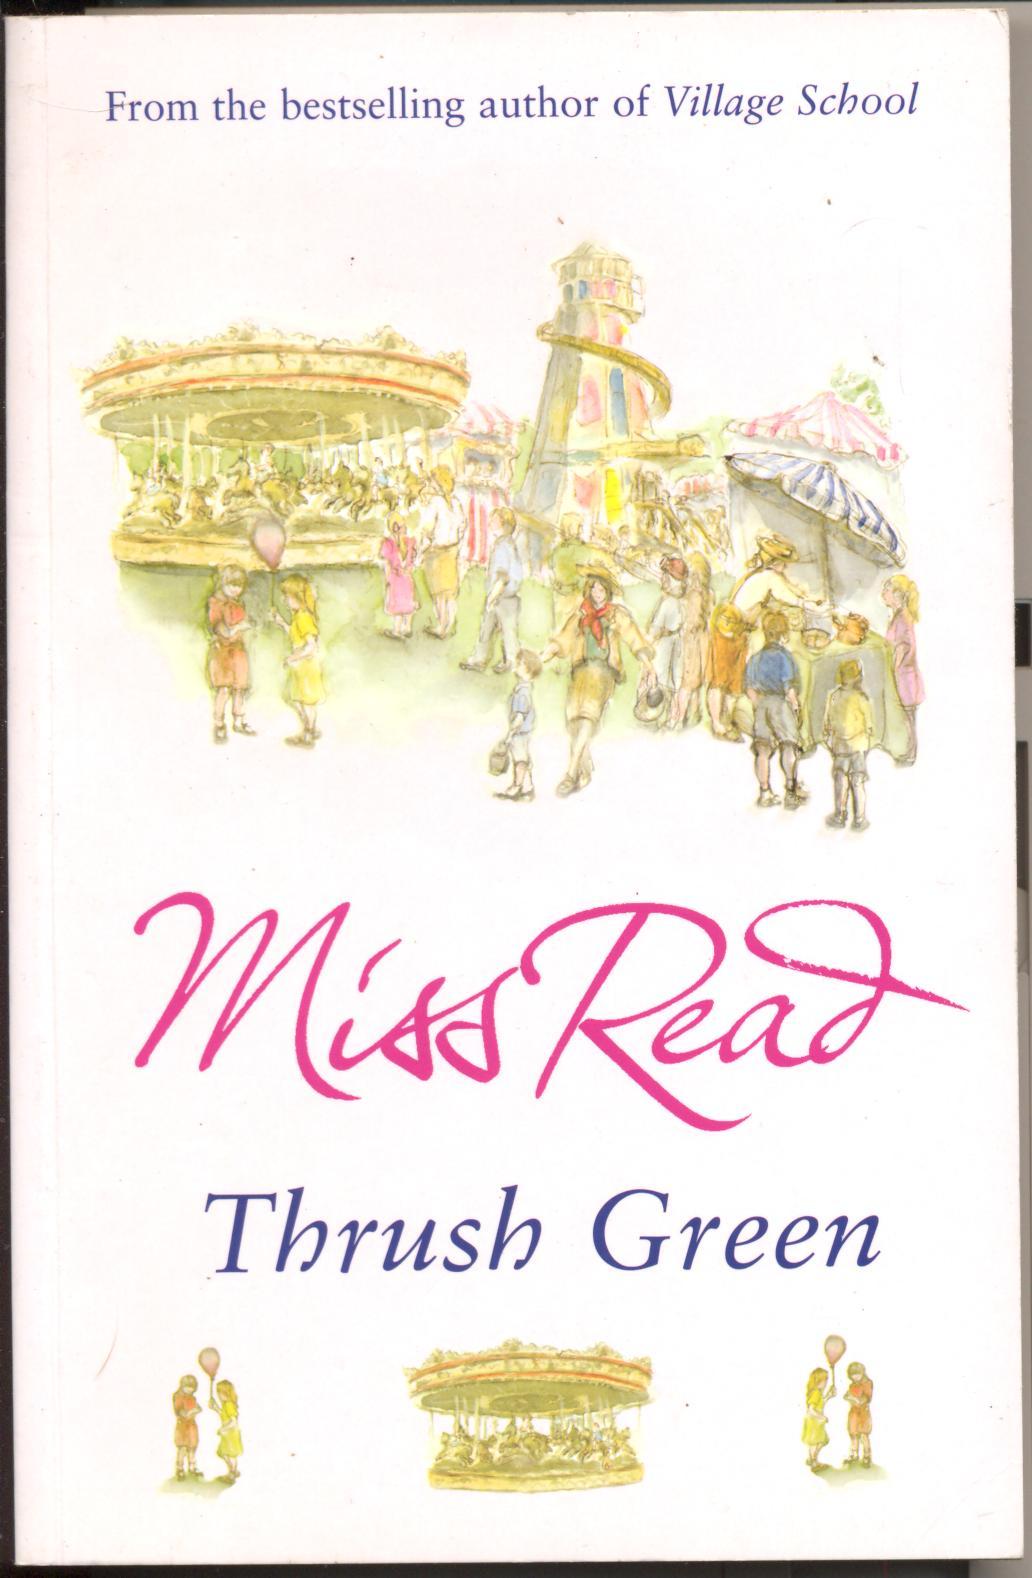 Thrush Green - Miss Read